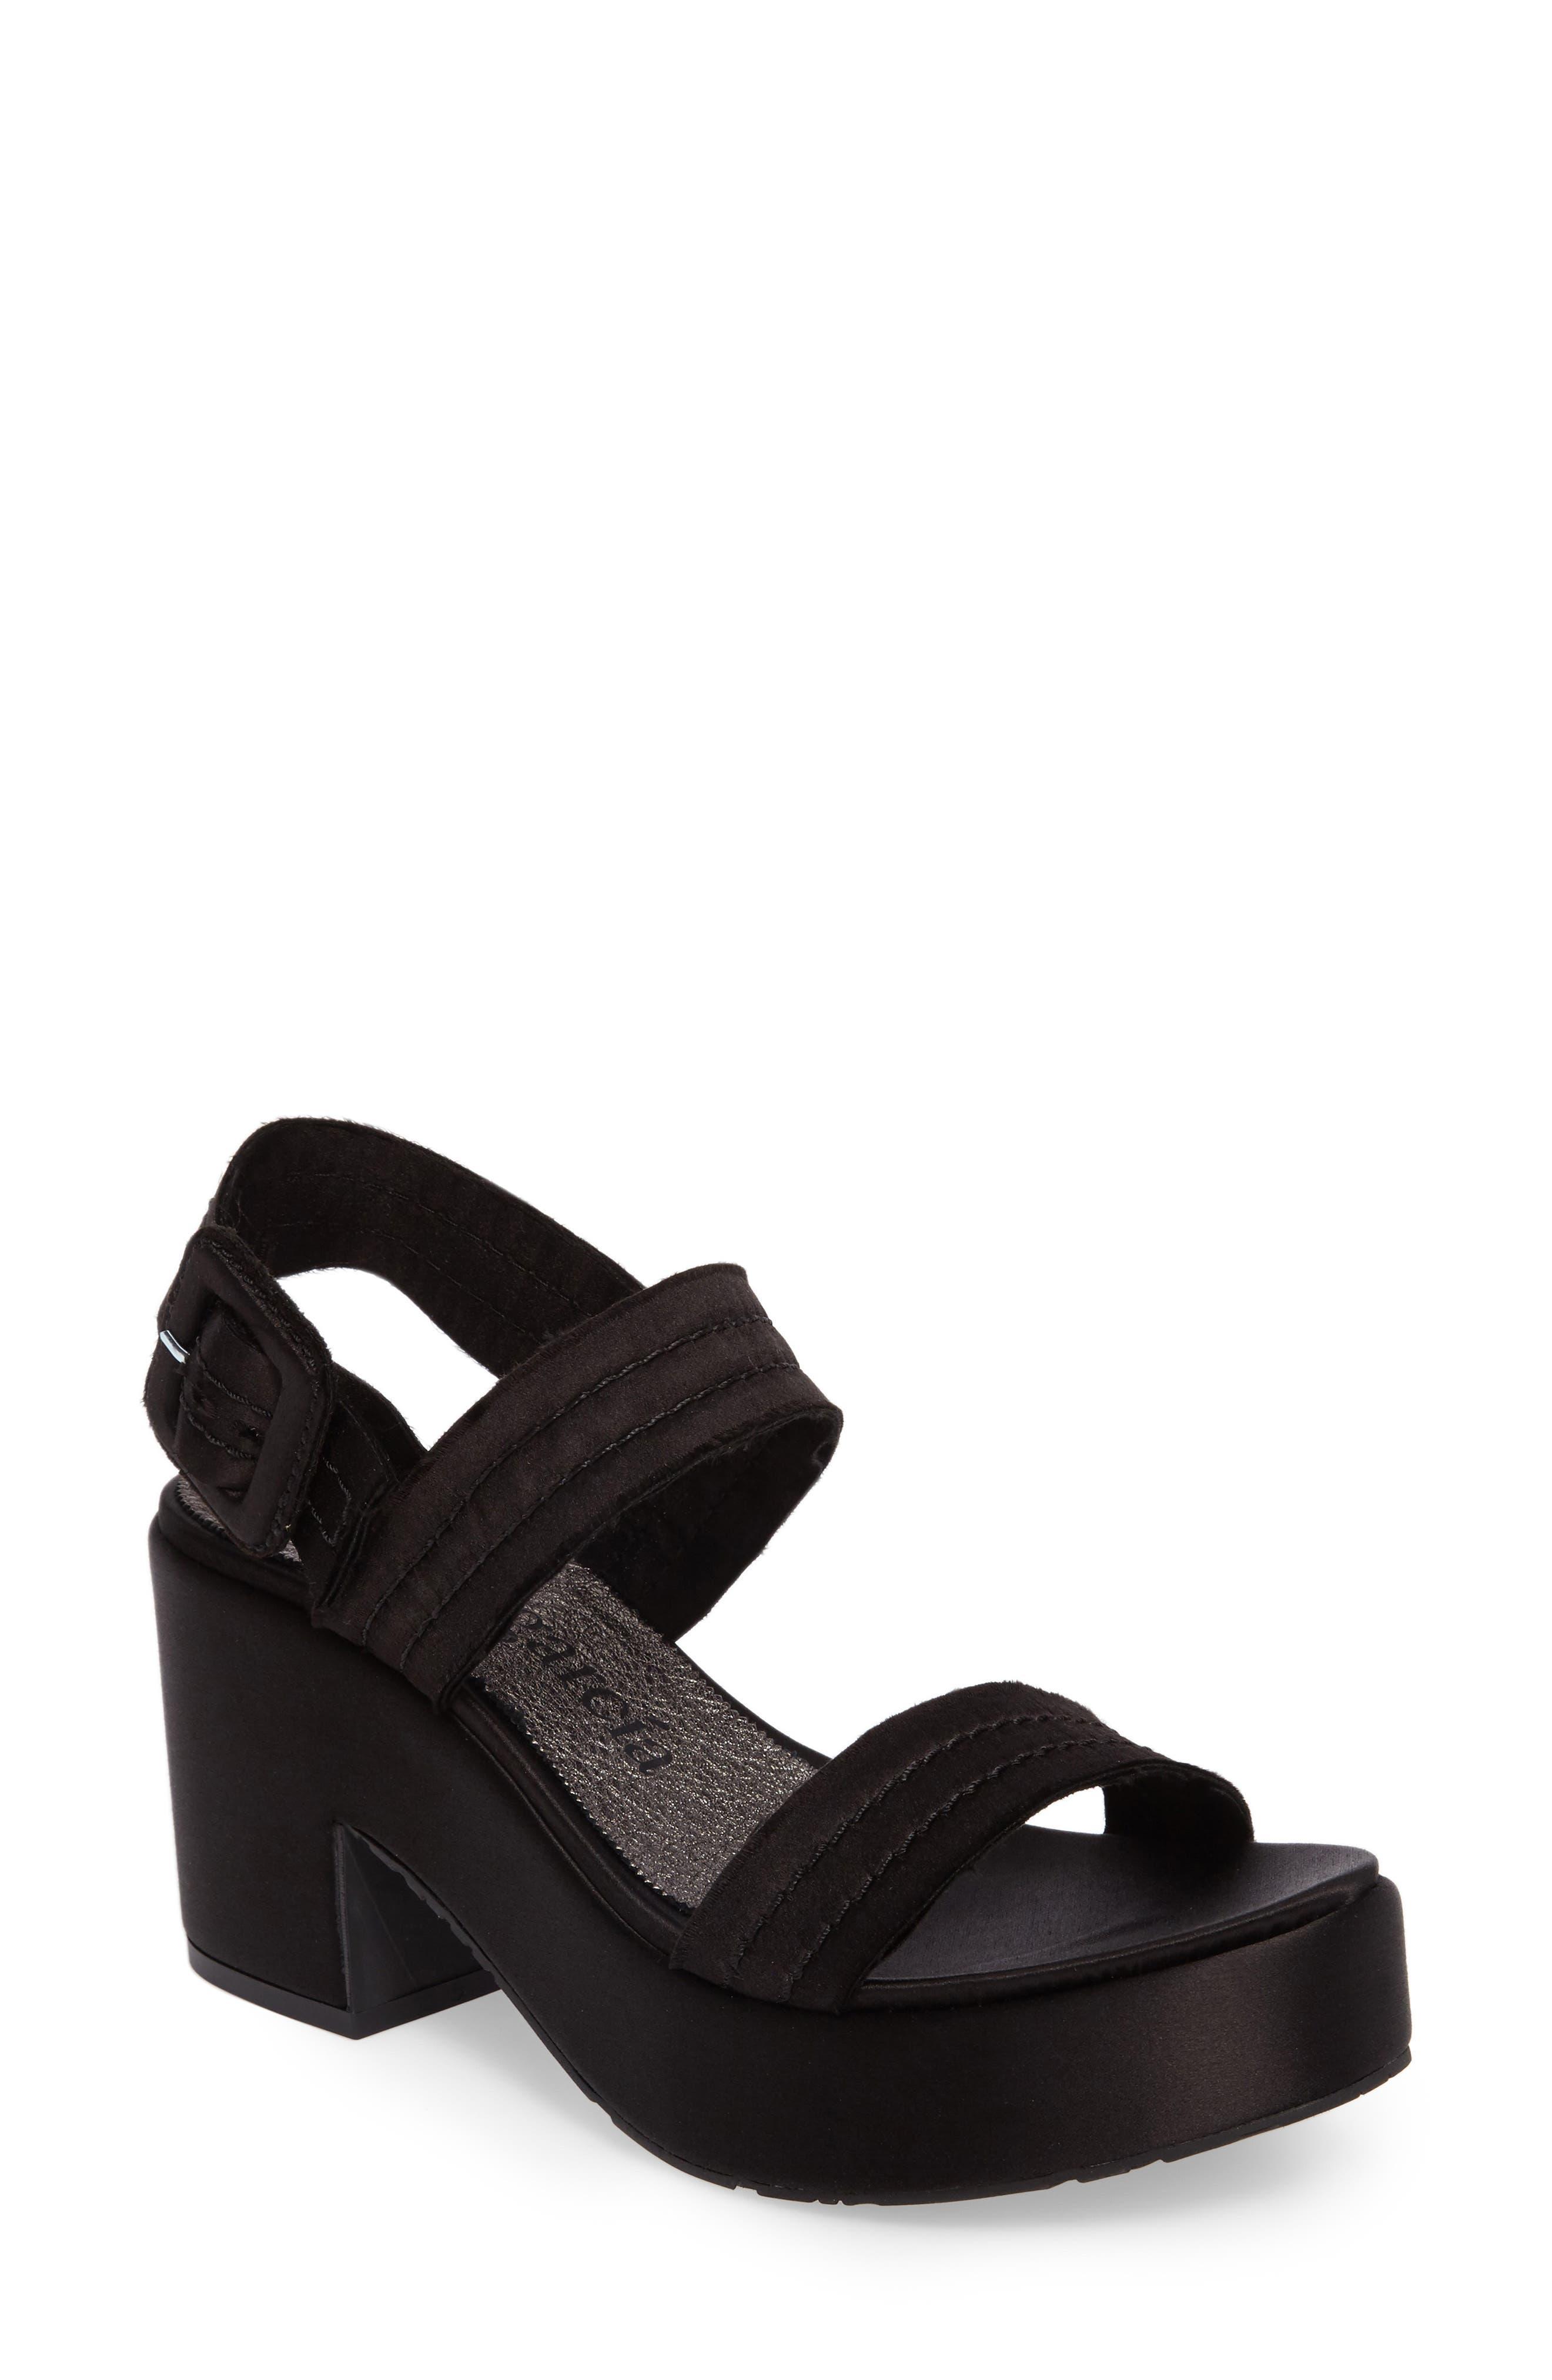 Decima Platform Sandal,                             Main thumbnail 1, color,                             001